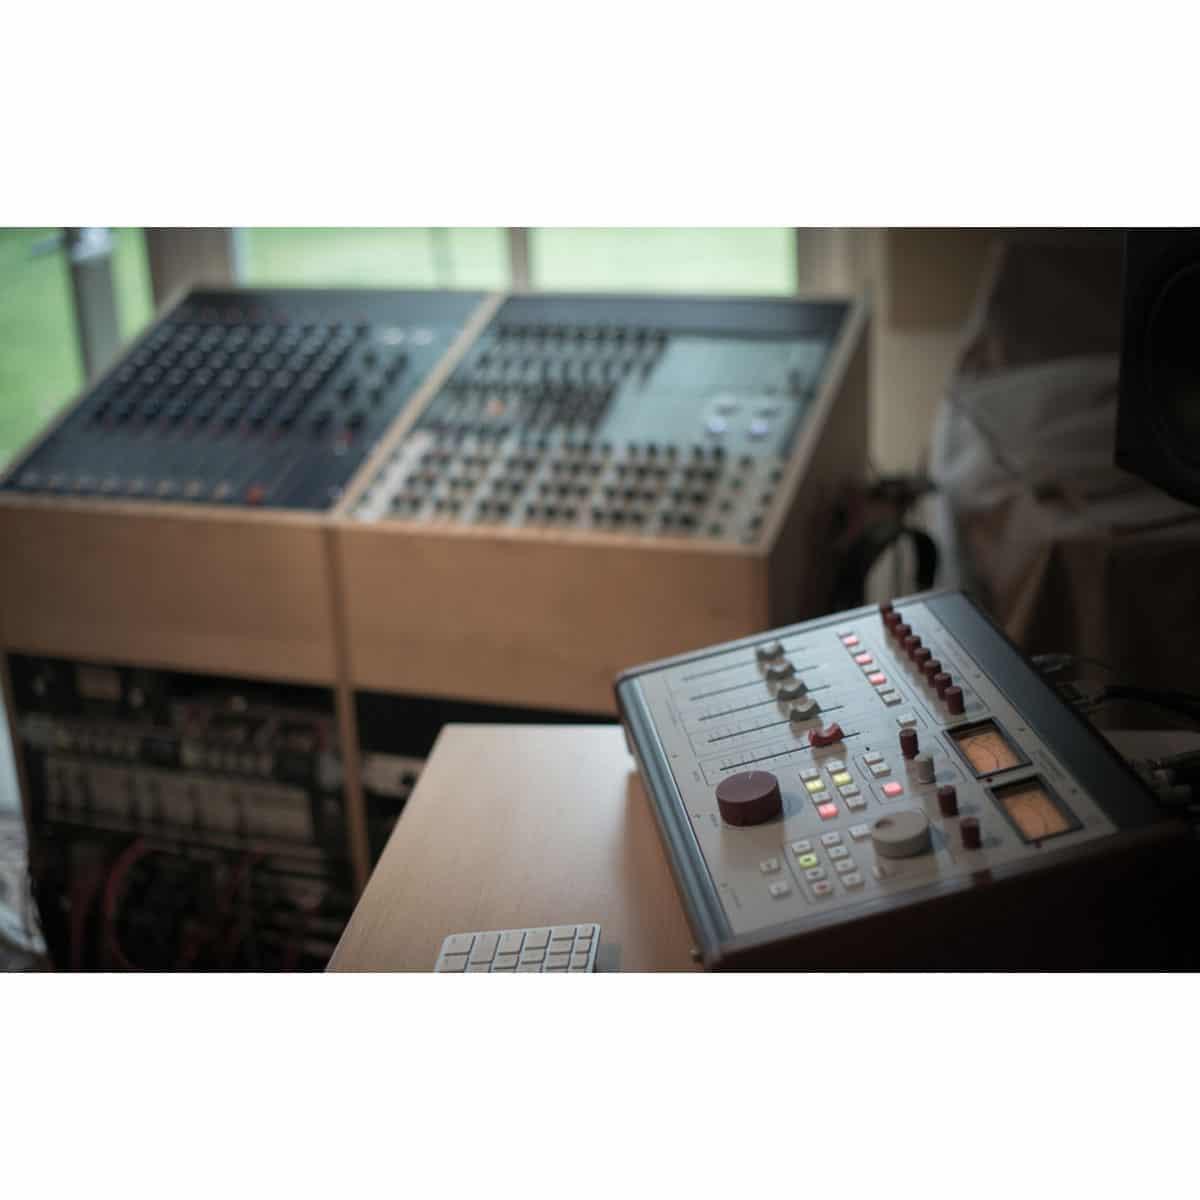 Rupert Neve 5060 Centerpiece 04 Pro Audio, Outboard, Sommatori e Mixer